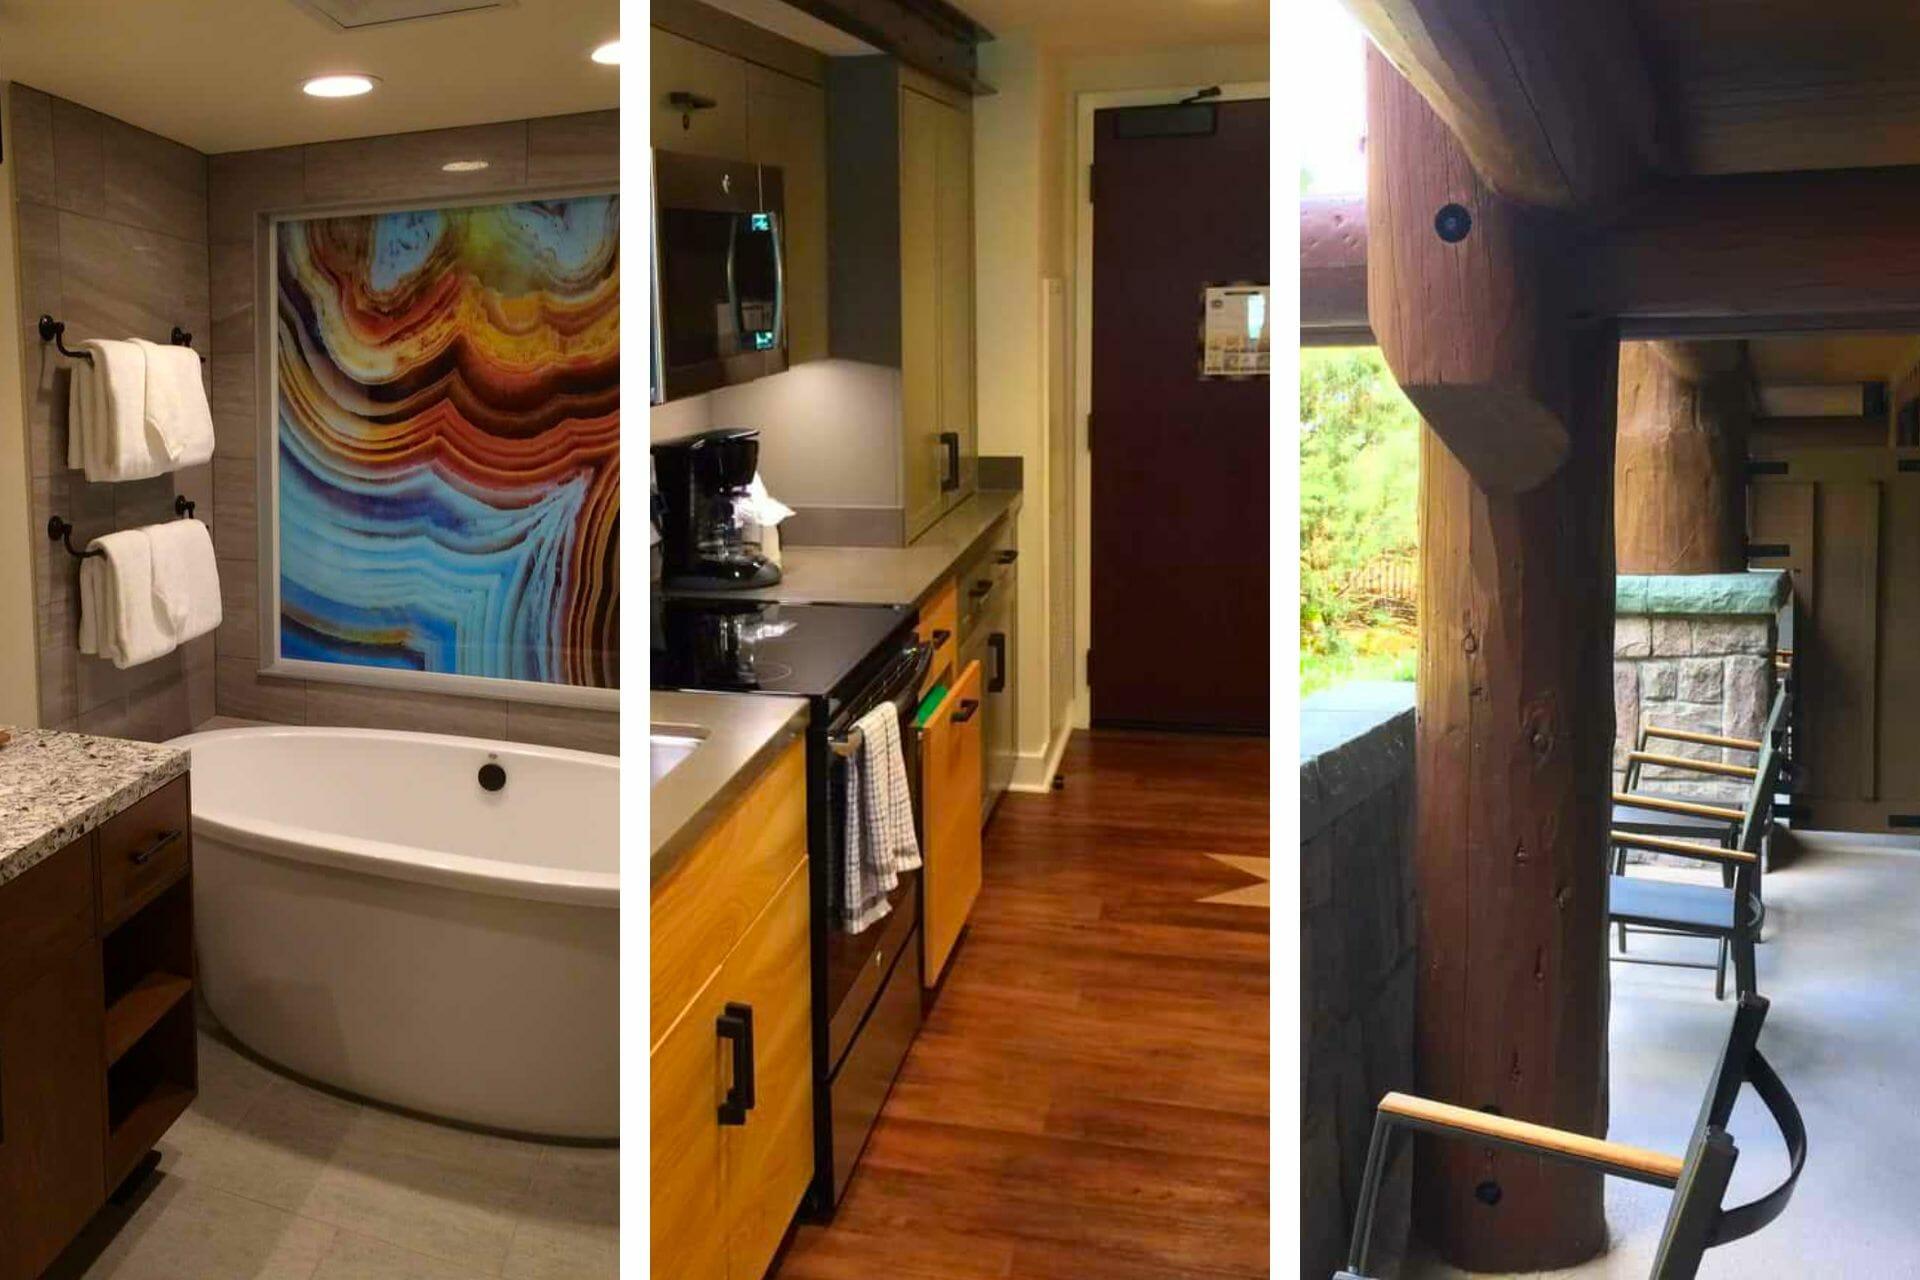 Honest Copper Creek One Bedroom Villas Review at Disney's Wilderness Lodge (2021) via @allamericanatlas